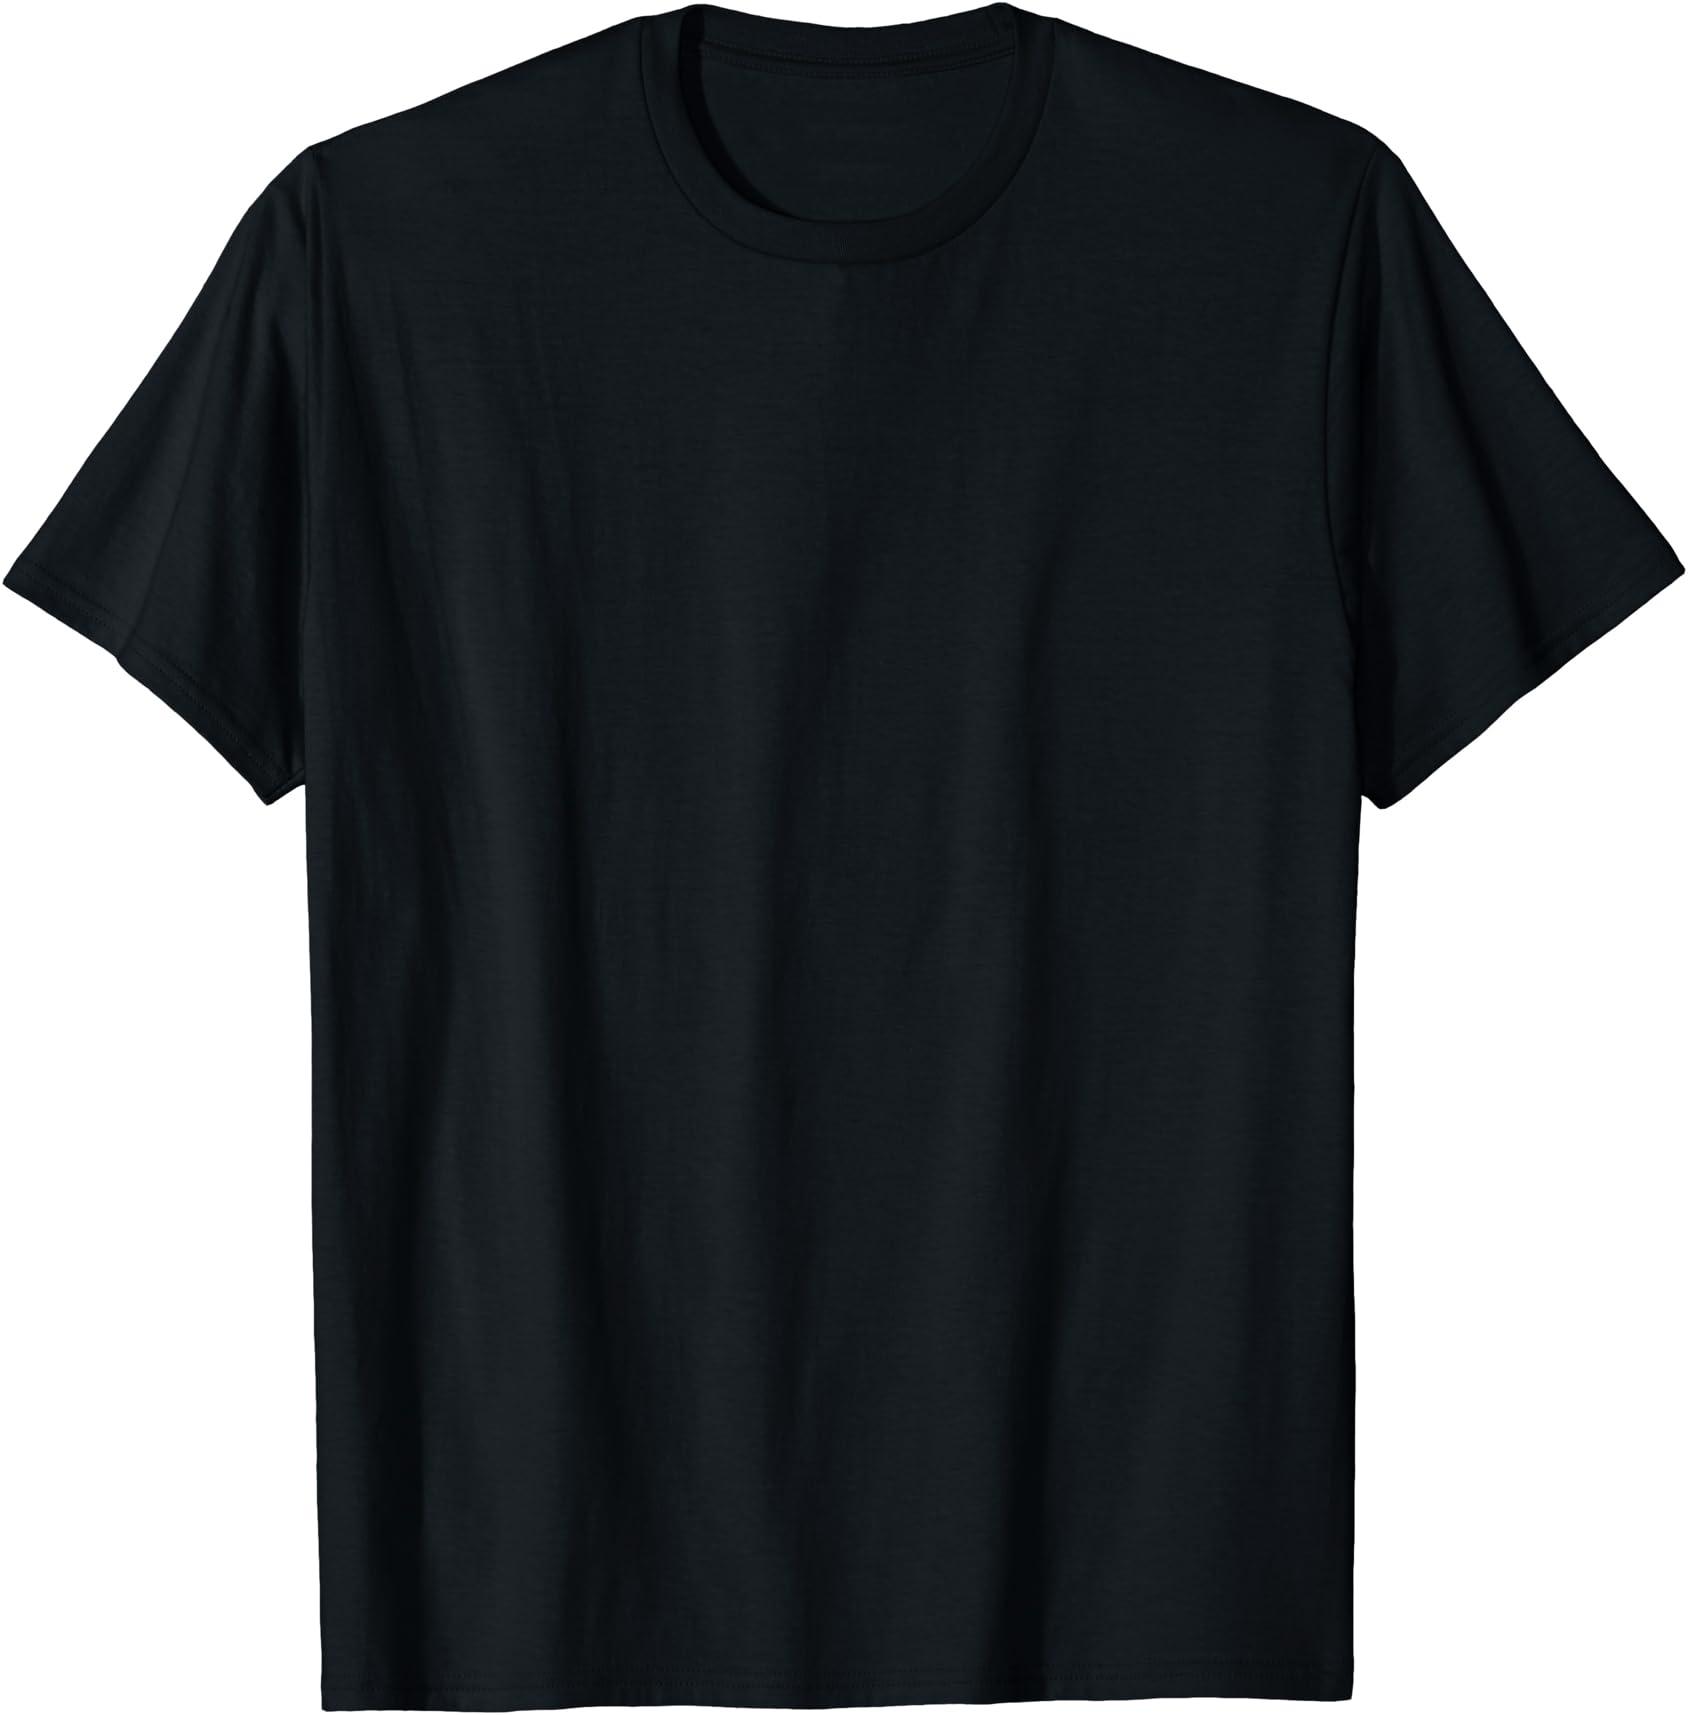 100th Day of School for Kids Men Women Owl Cute Long Sleeve T-Shirt